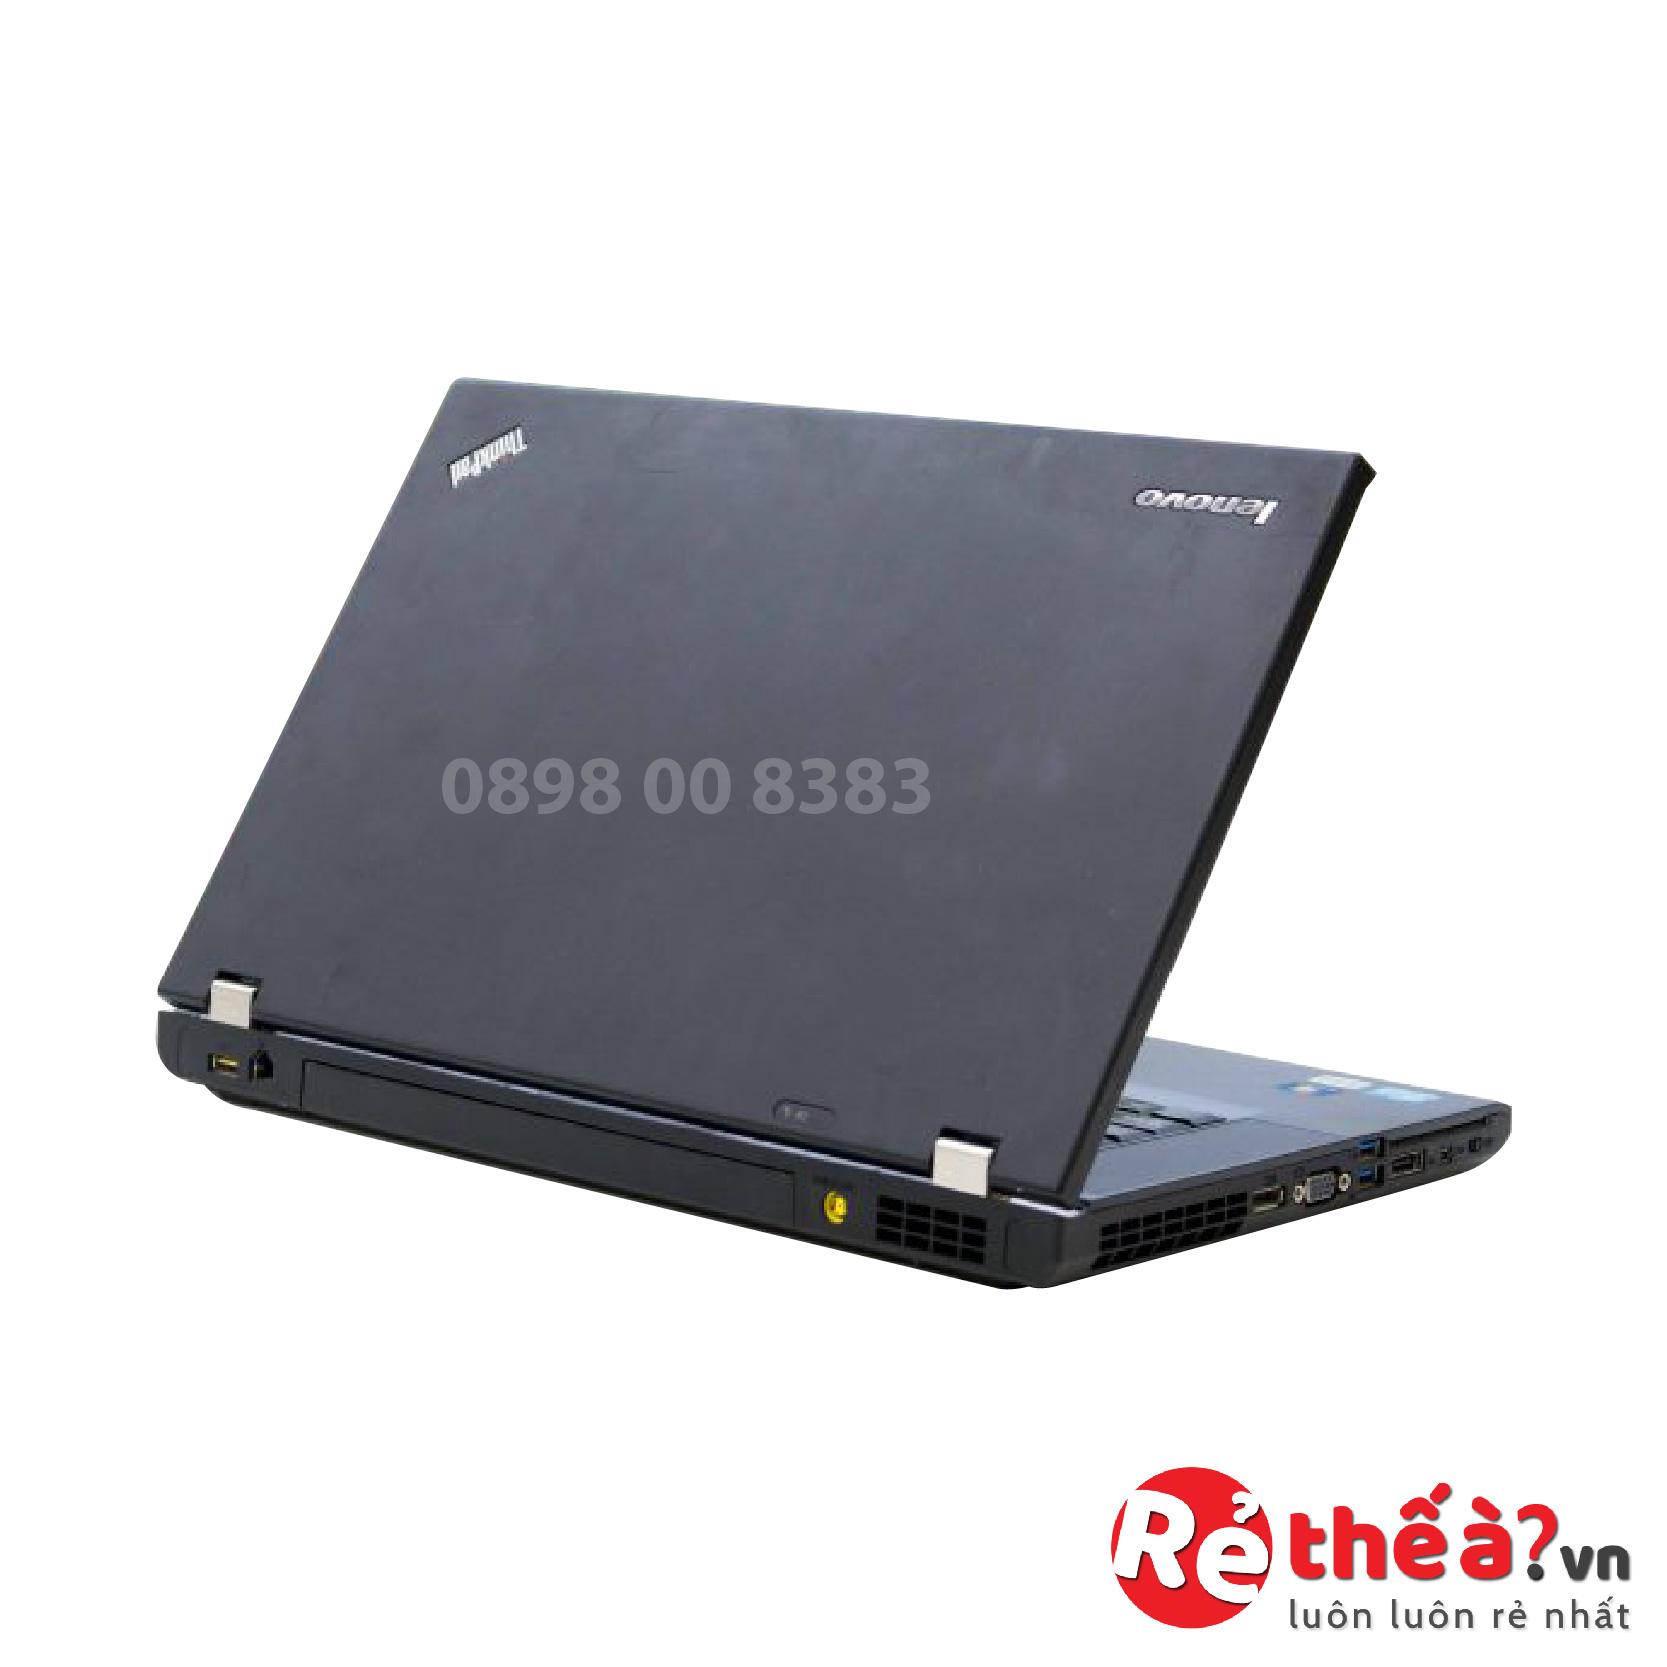 Laptop Lenovo Thinkpad W520